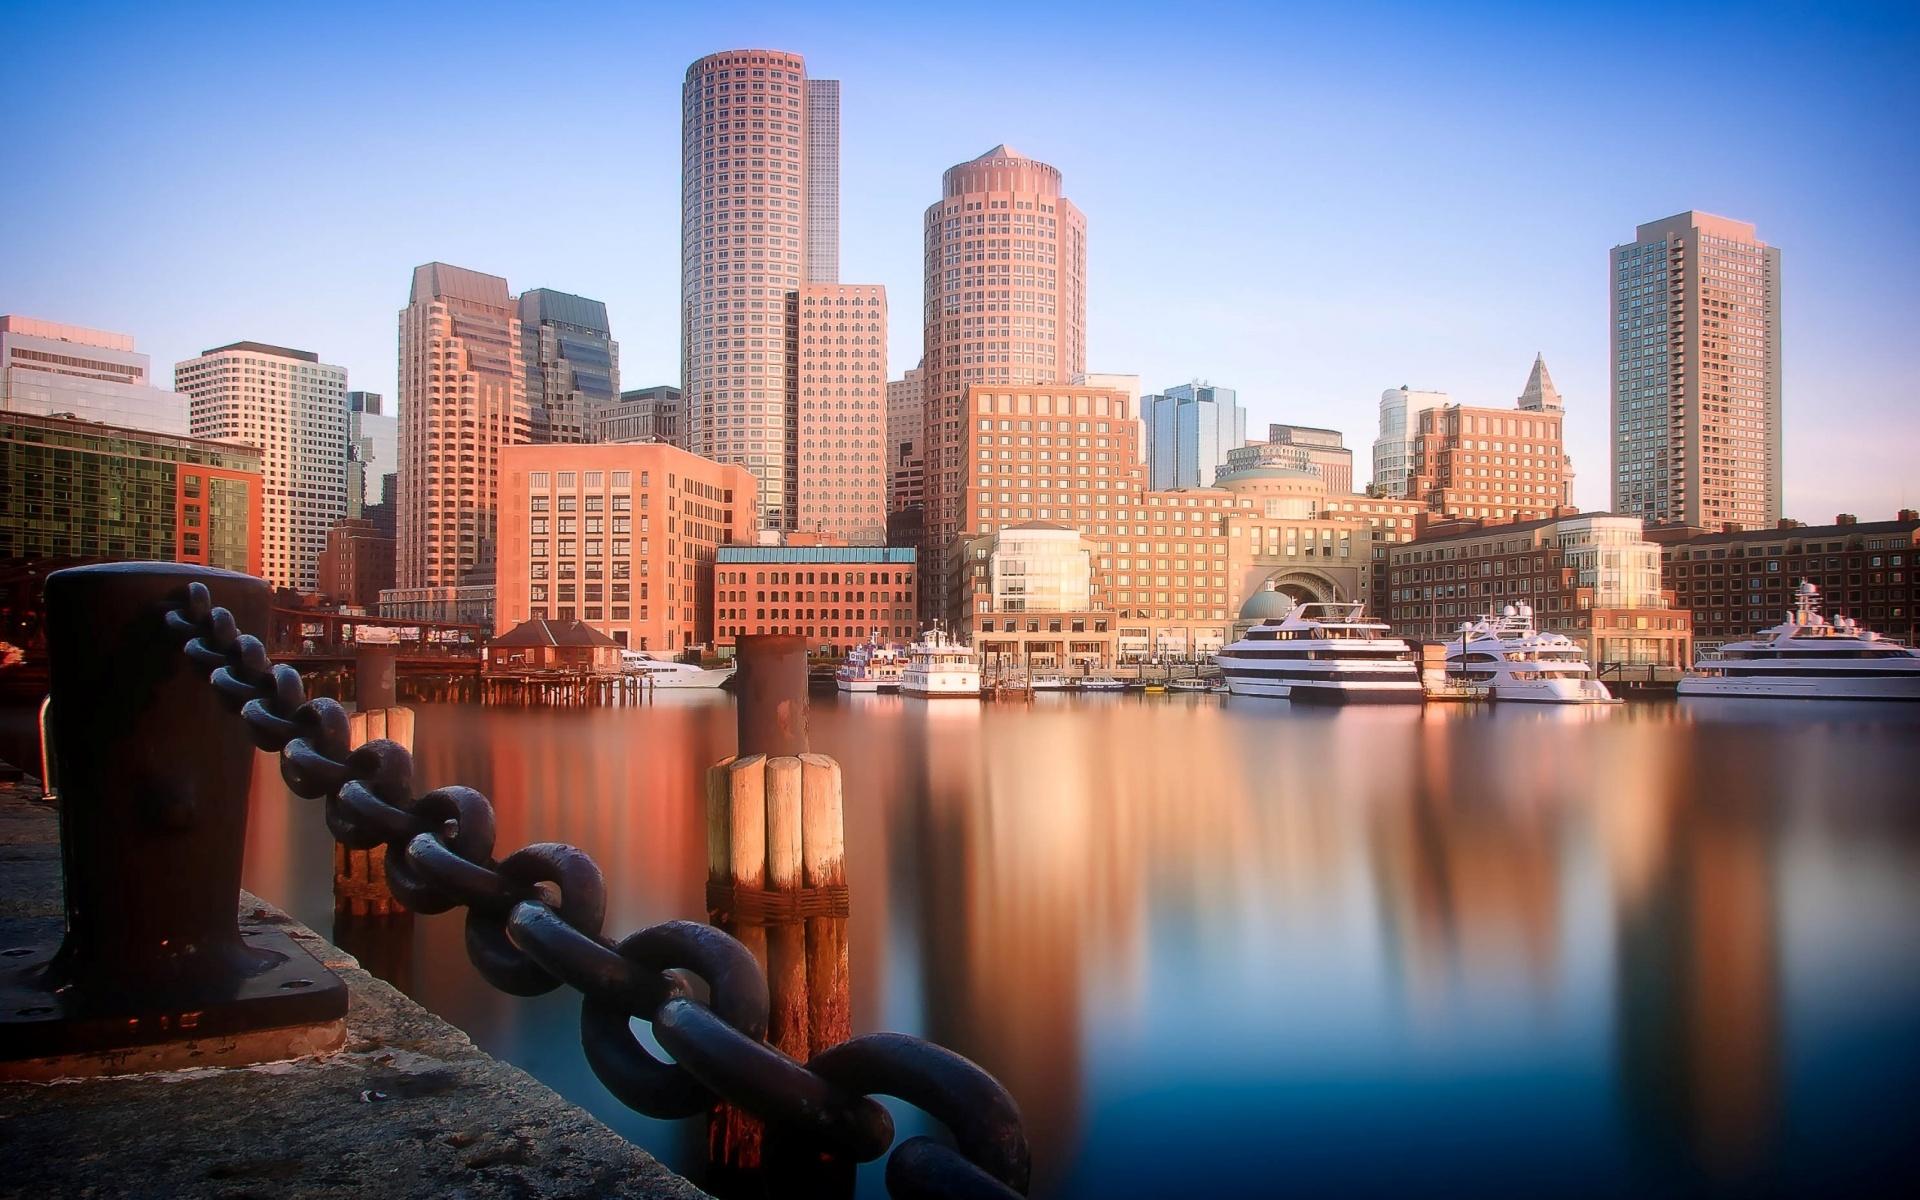 boston morning wallpapers 1920x1200 695901